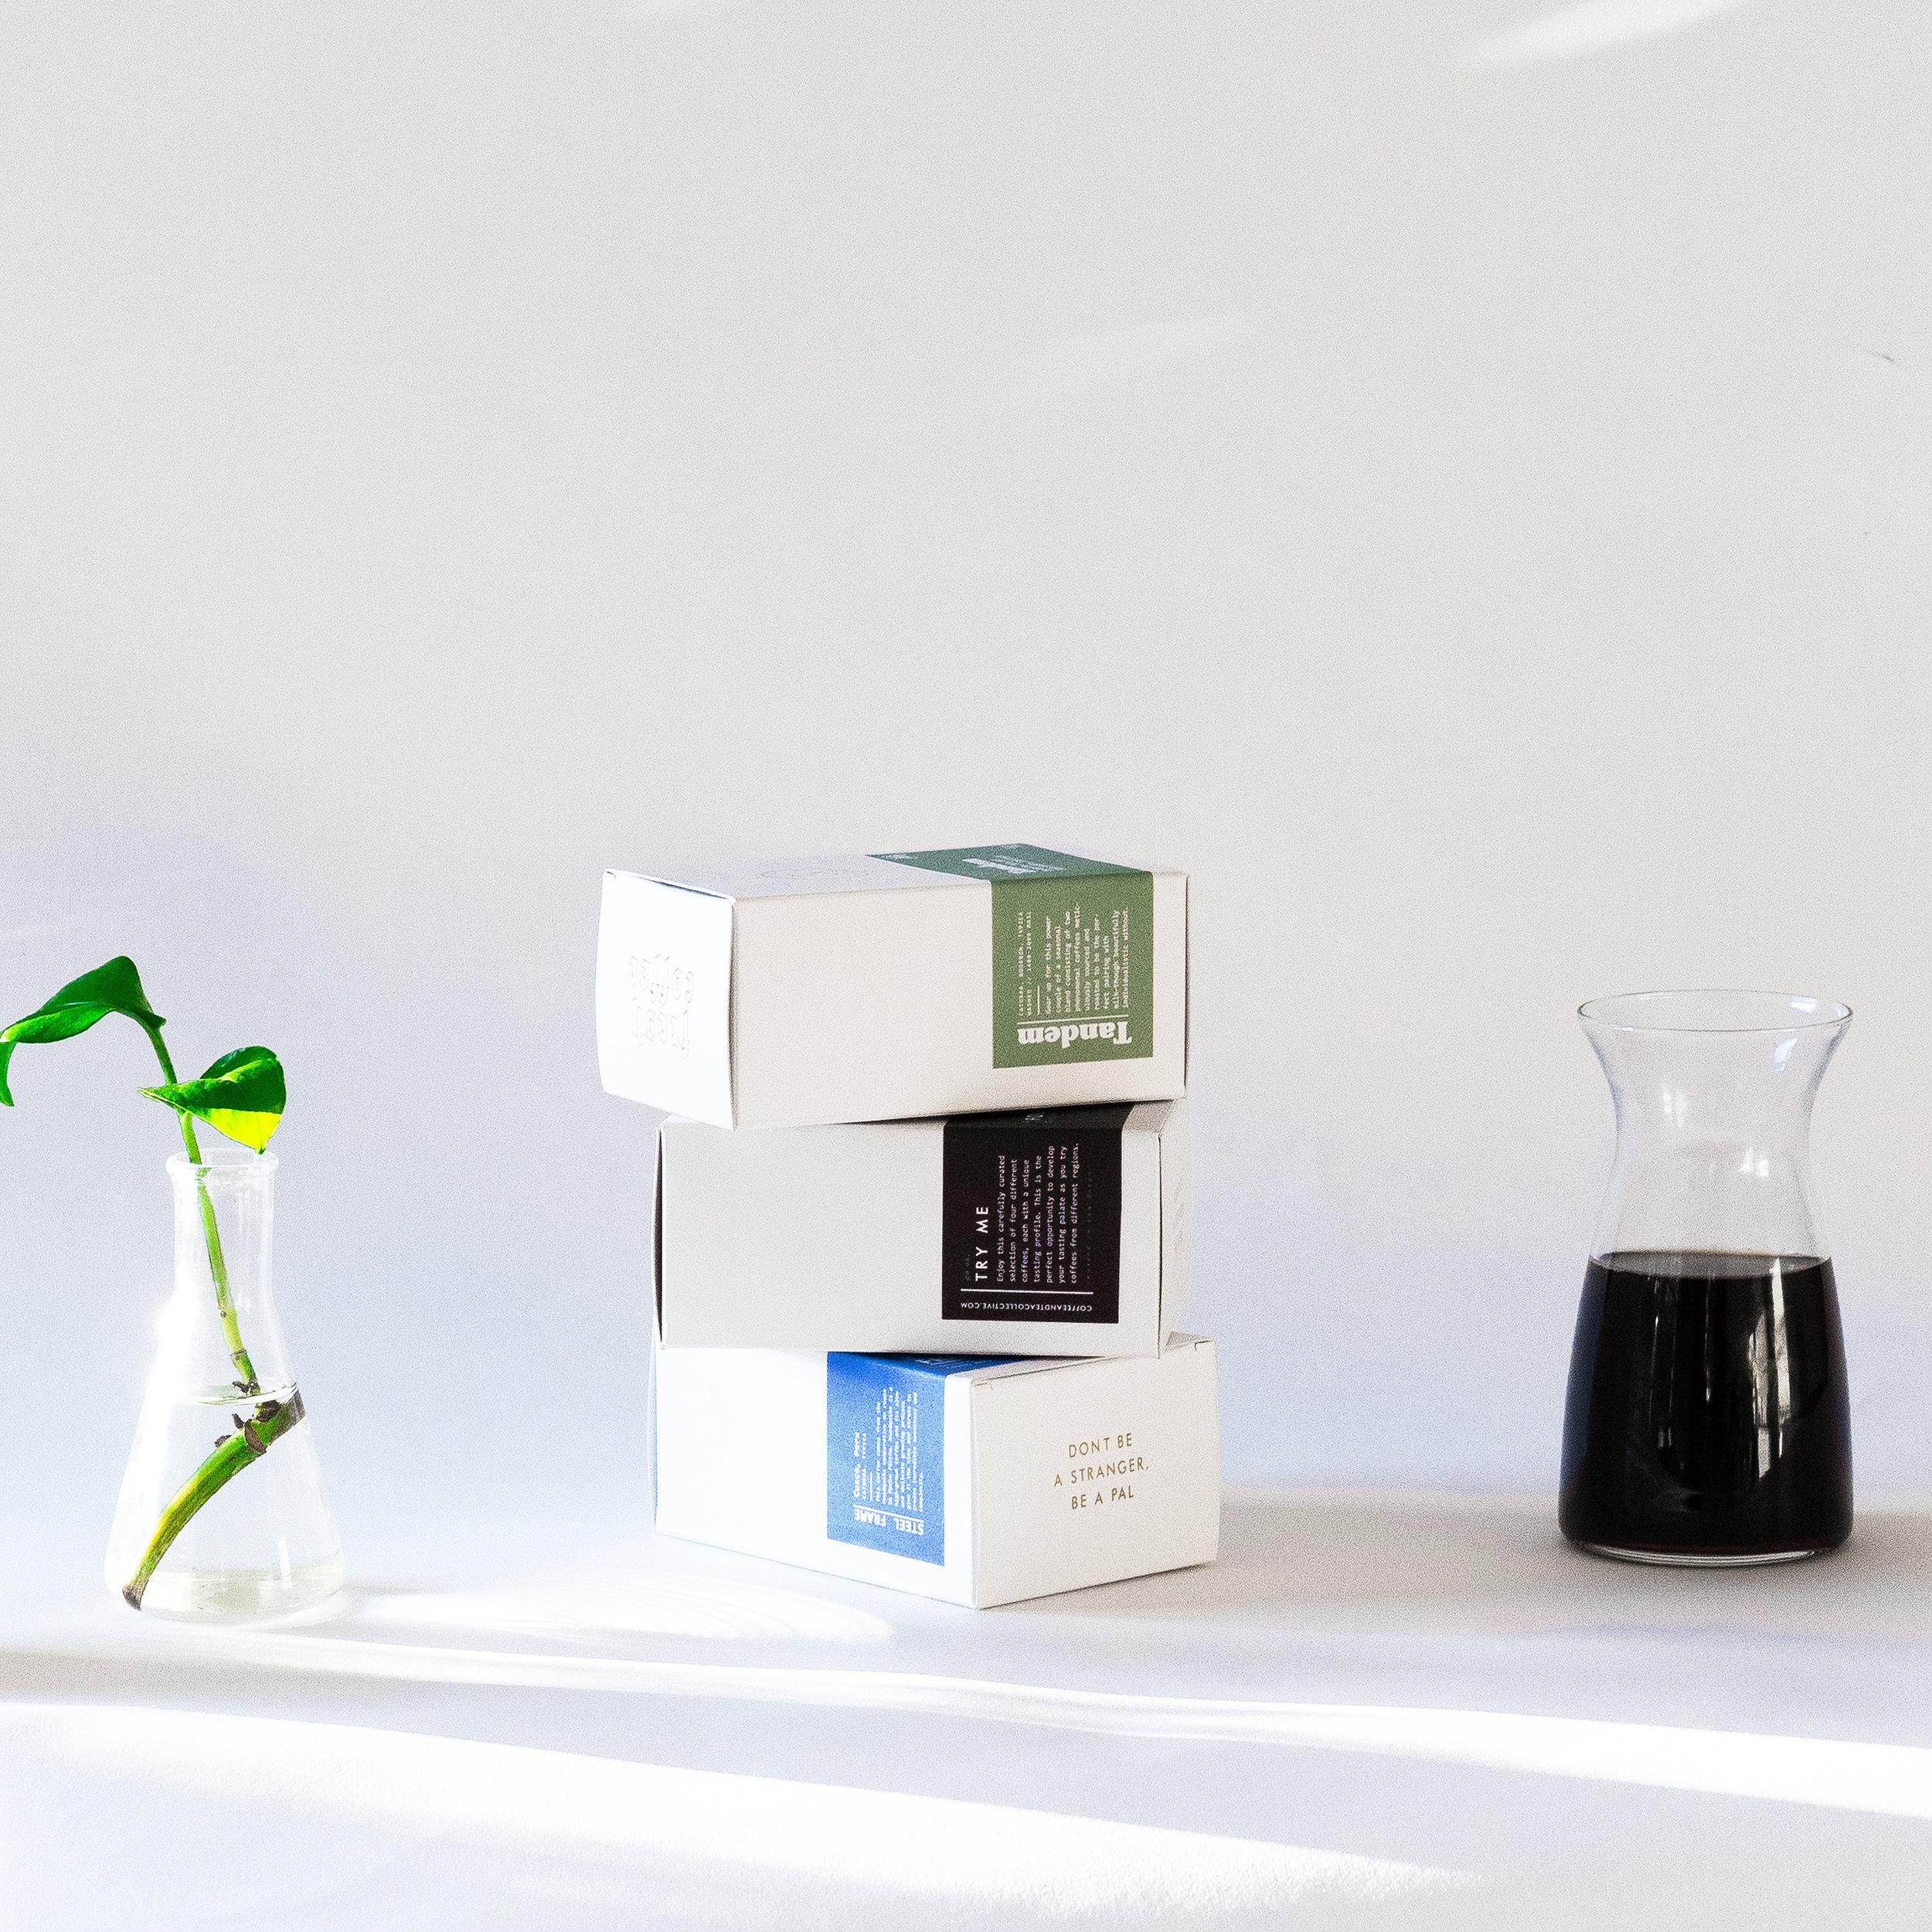 packaging designers coffee box branding San Diego creative